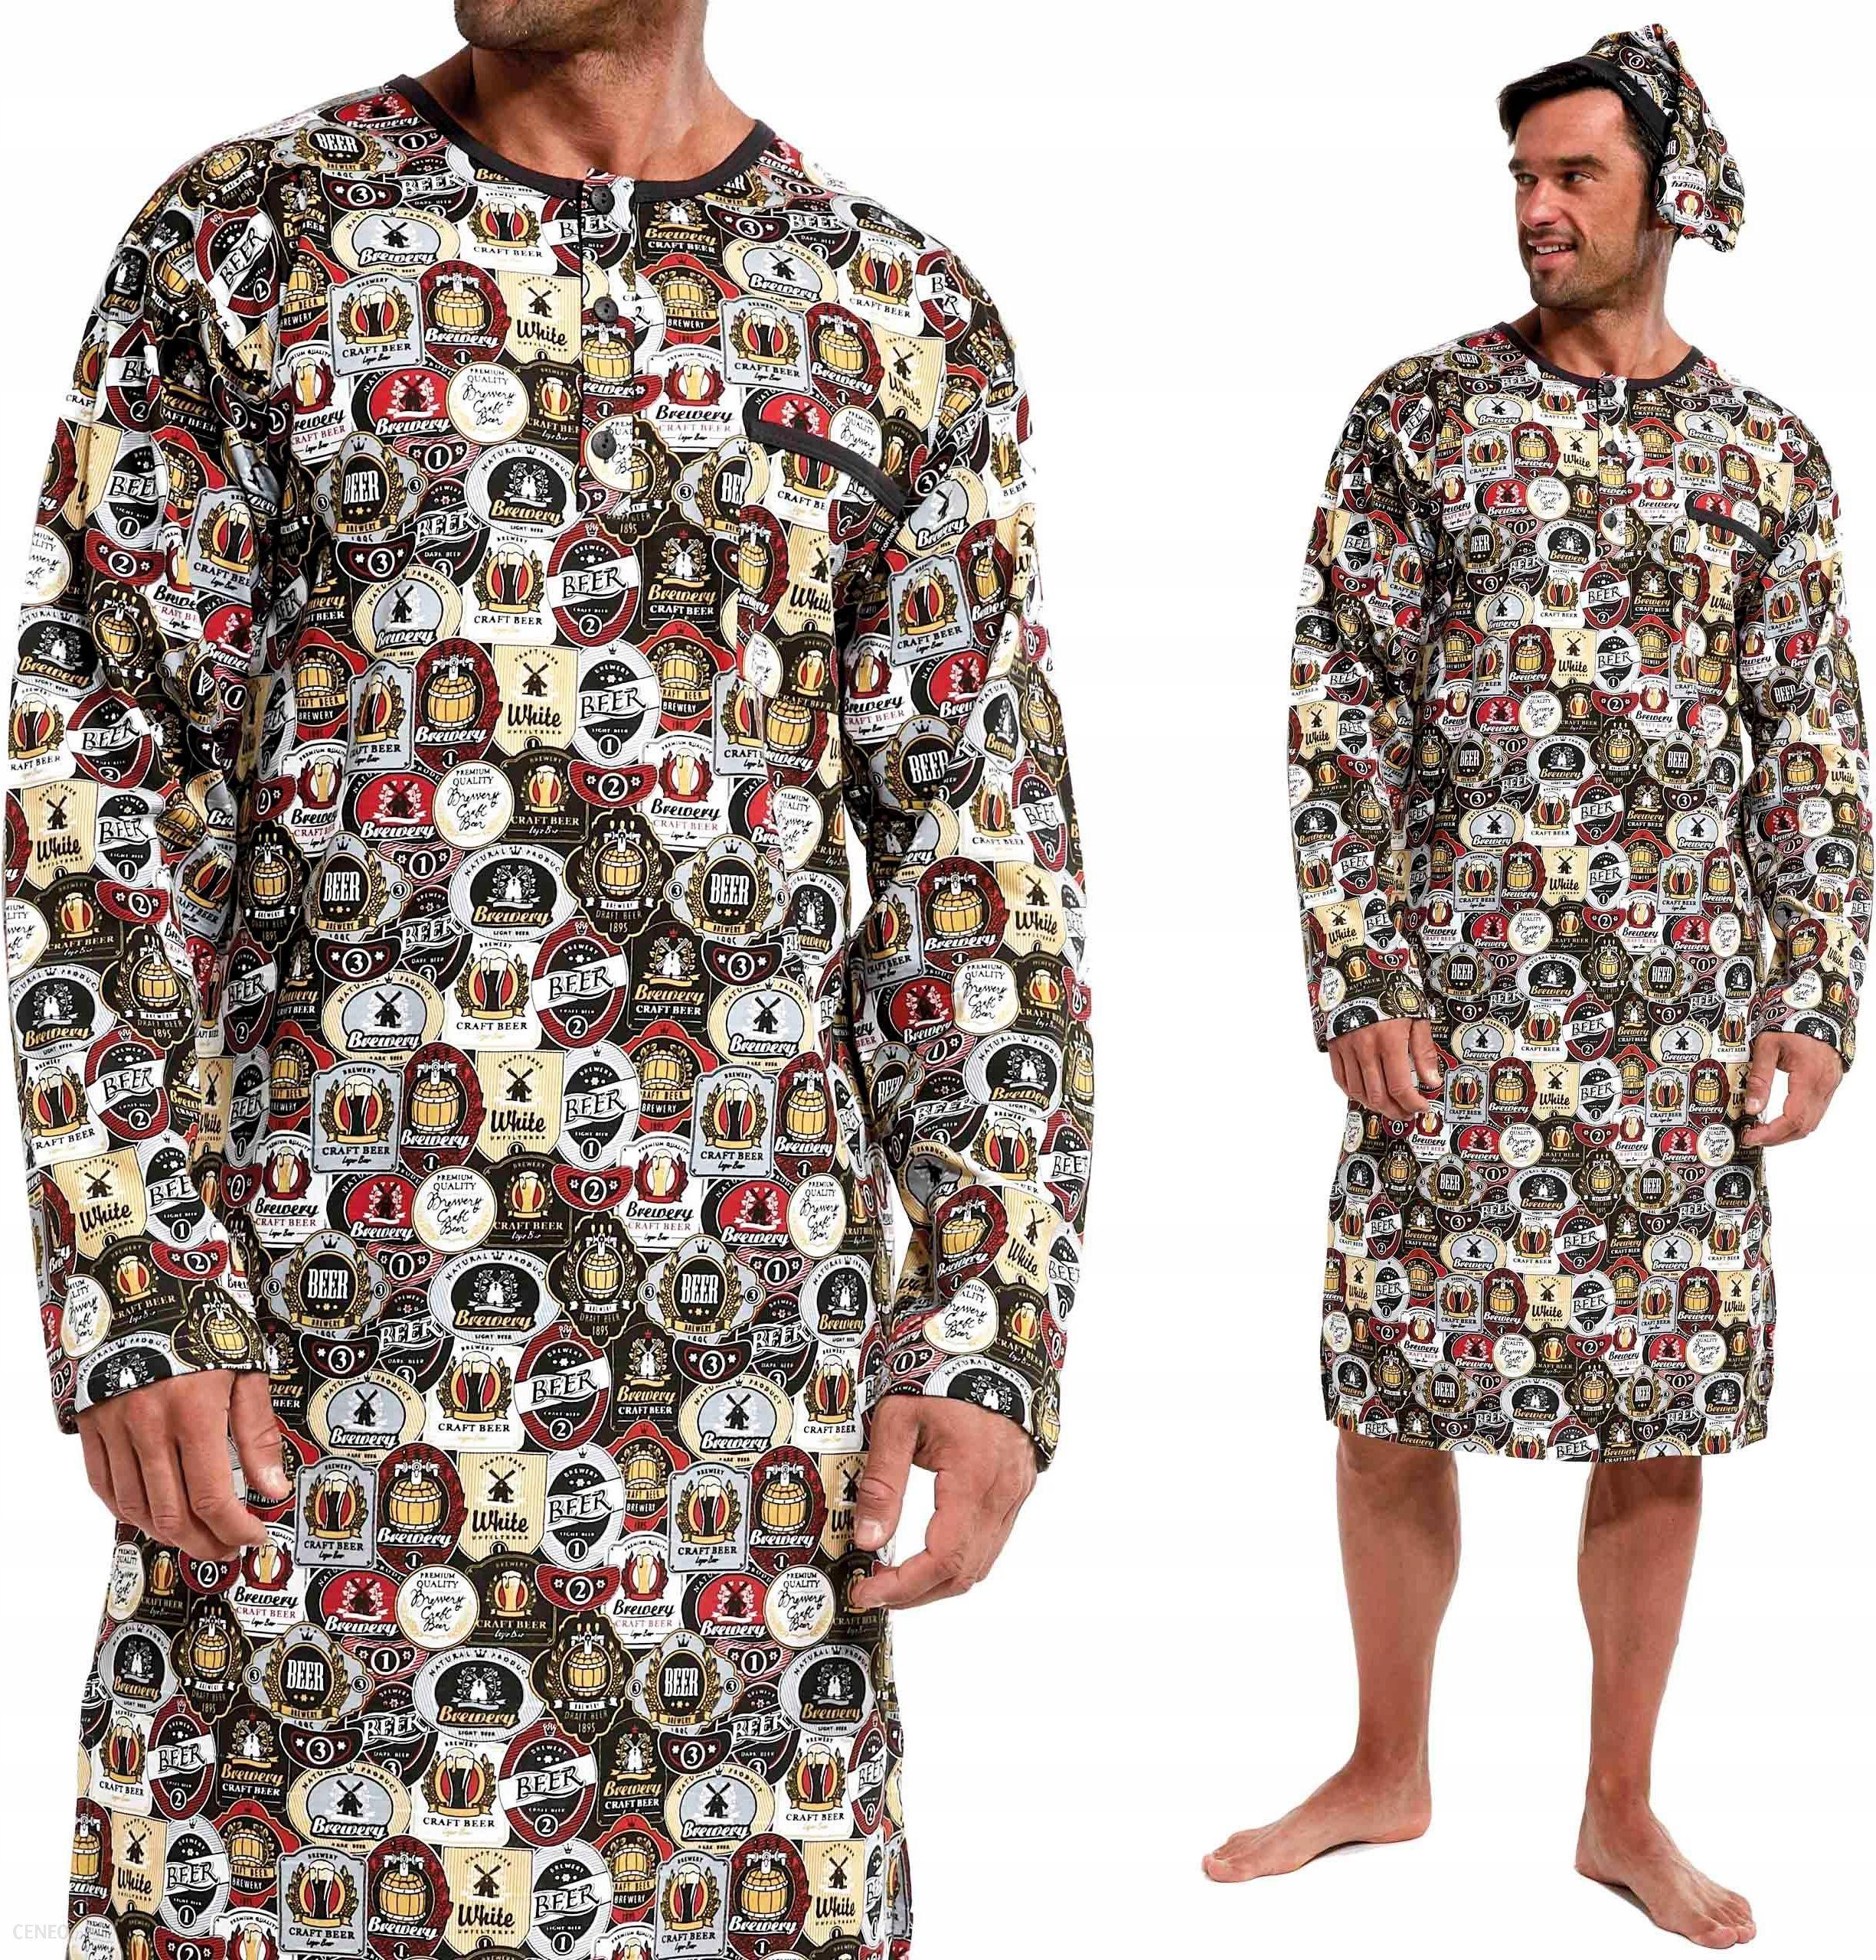 643301 110 Cornette koszula męska nocna szlafmyca Ceny i  dURBr